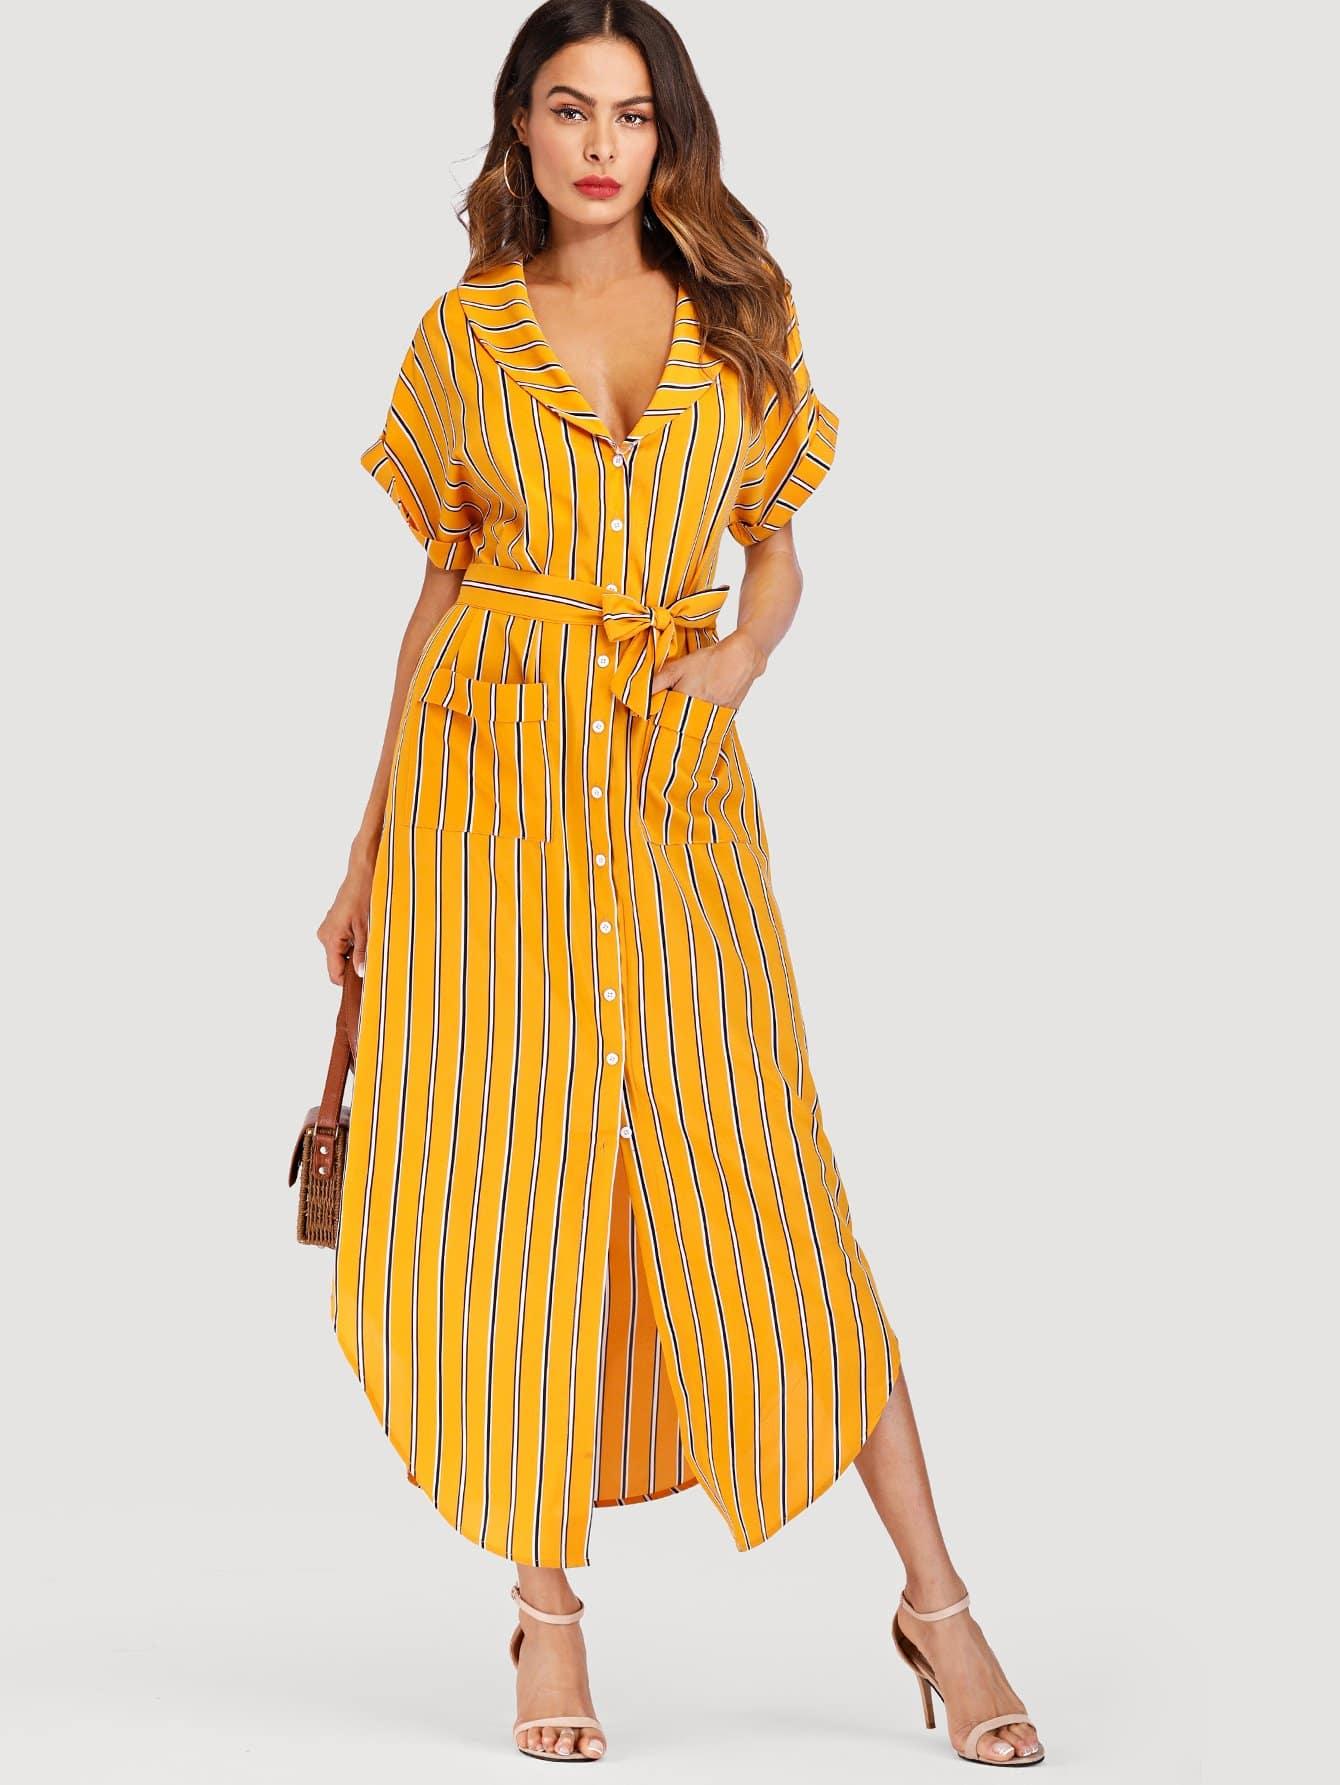 Curved Hem Striped Shirt Dress curved hem striped shirt dress